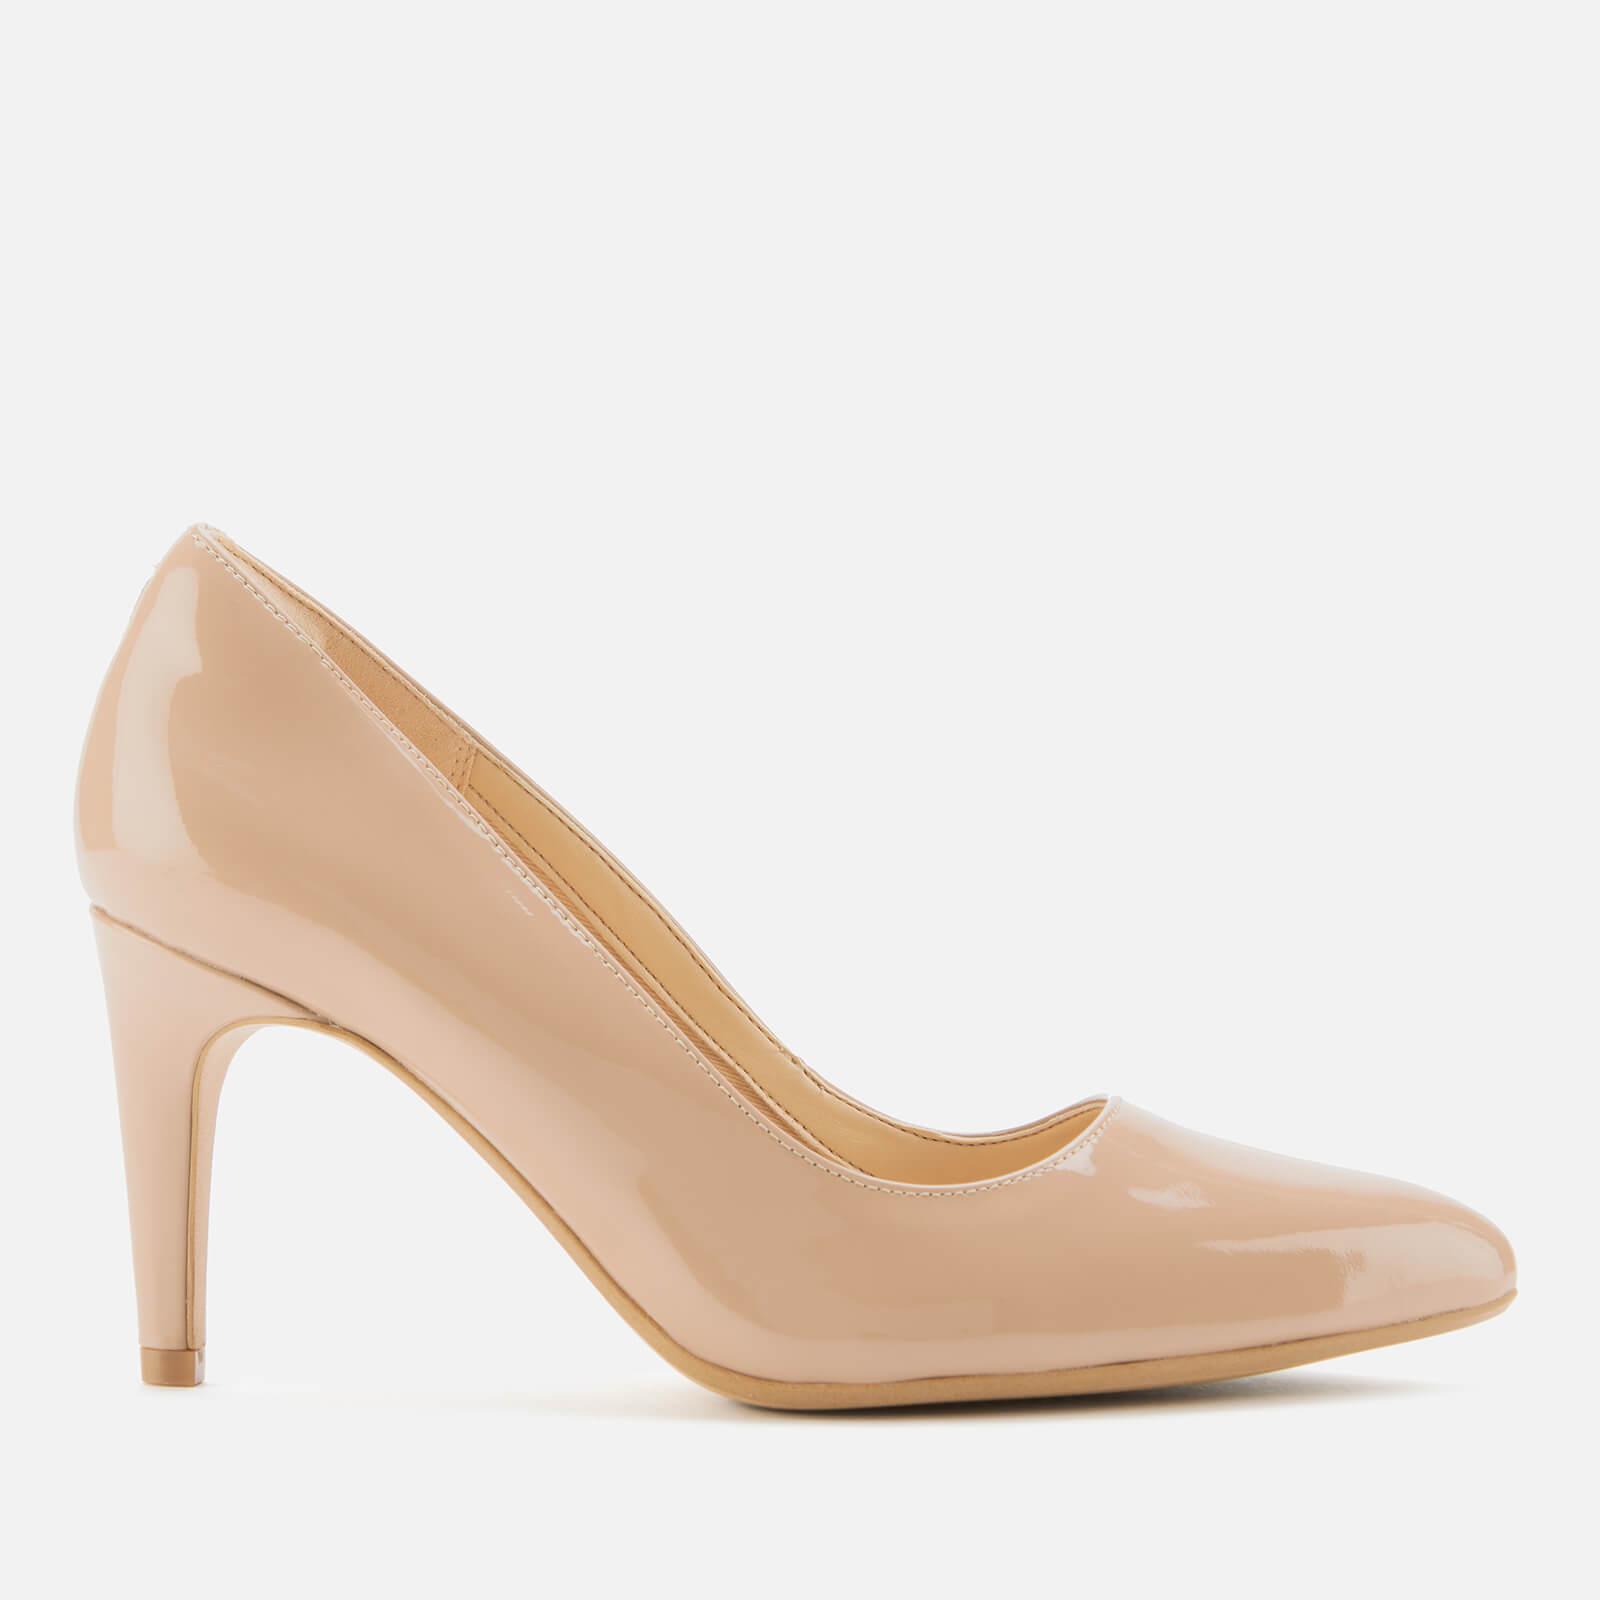 Clarks Women's Laina Rae Patent Court Shoes - Praline - UK 6